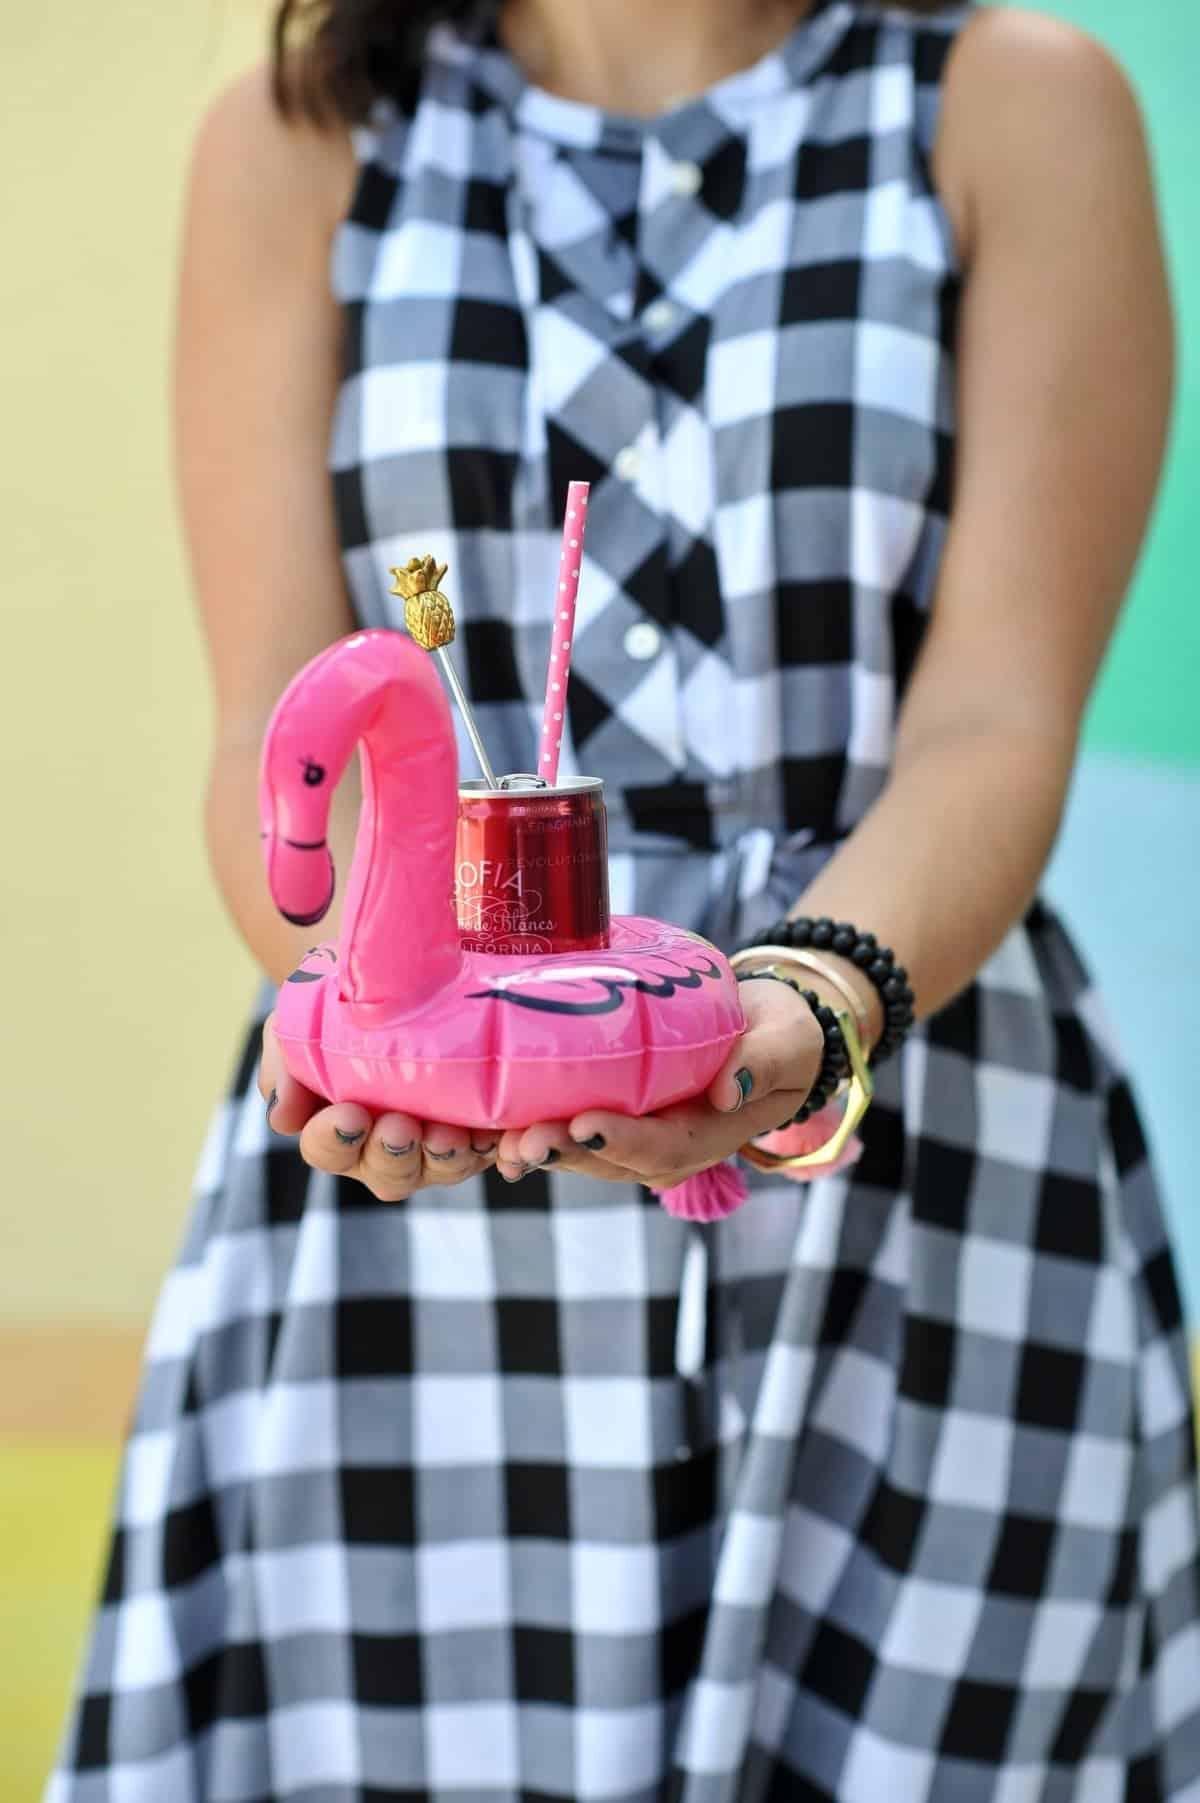 adult pool party ideas, swan pool float, flamingo inflatable drink holder via @mystylevita